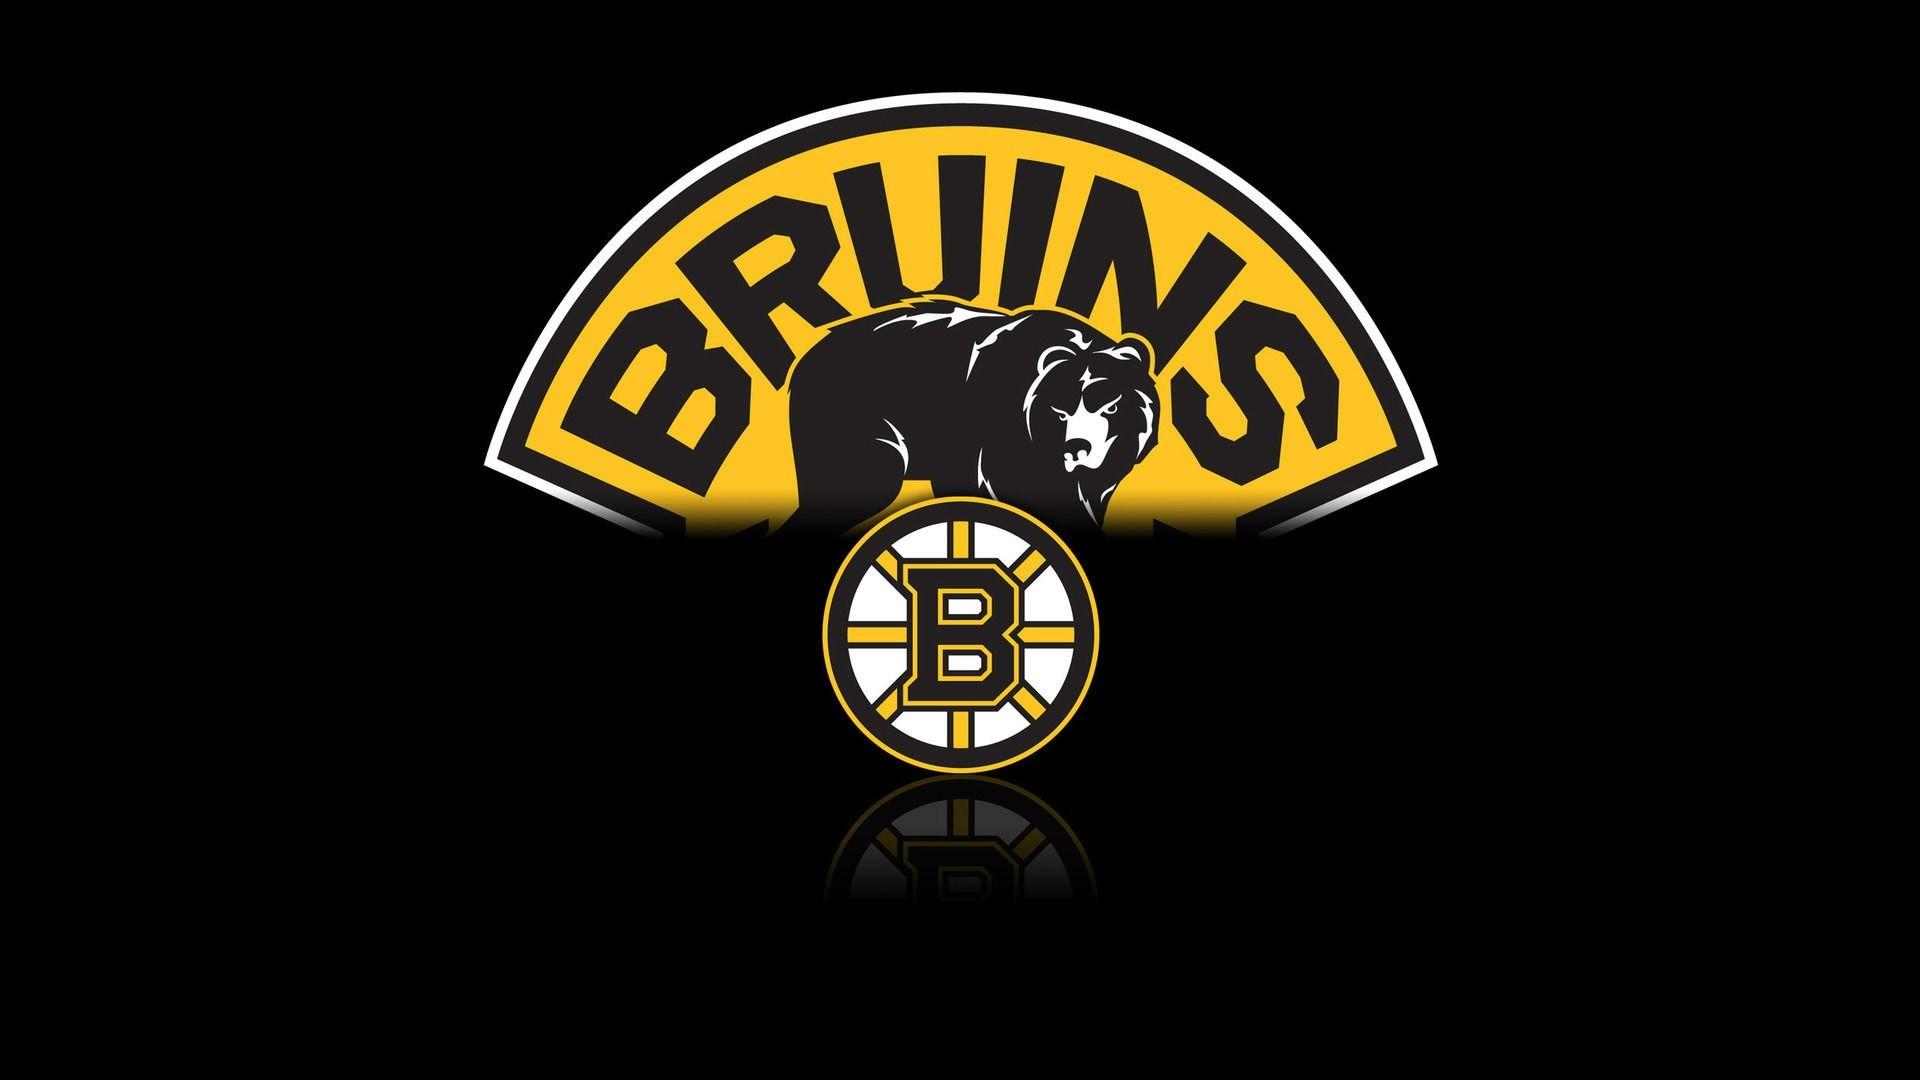 Res: 1920x1080, BOSTON BRUINS nhl hockey (40) wallpaper |  | 336555 | WallpaperUP